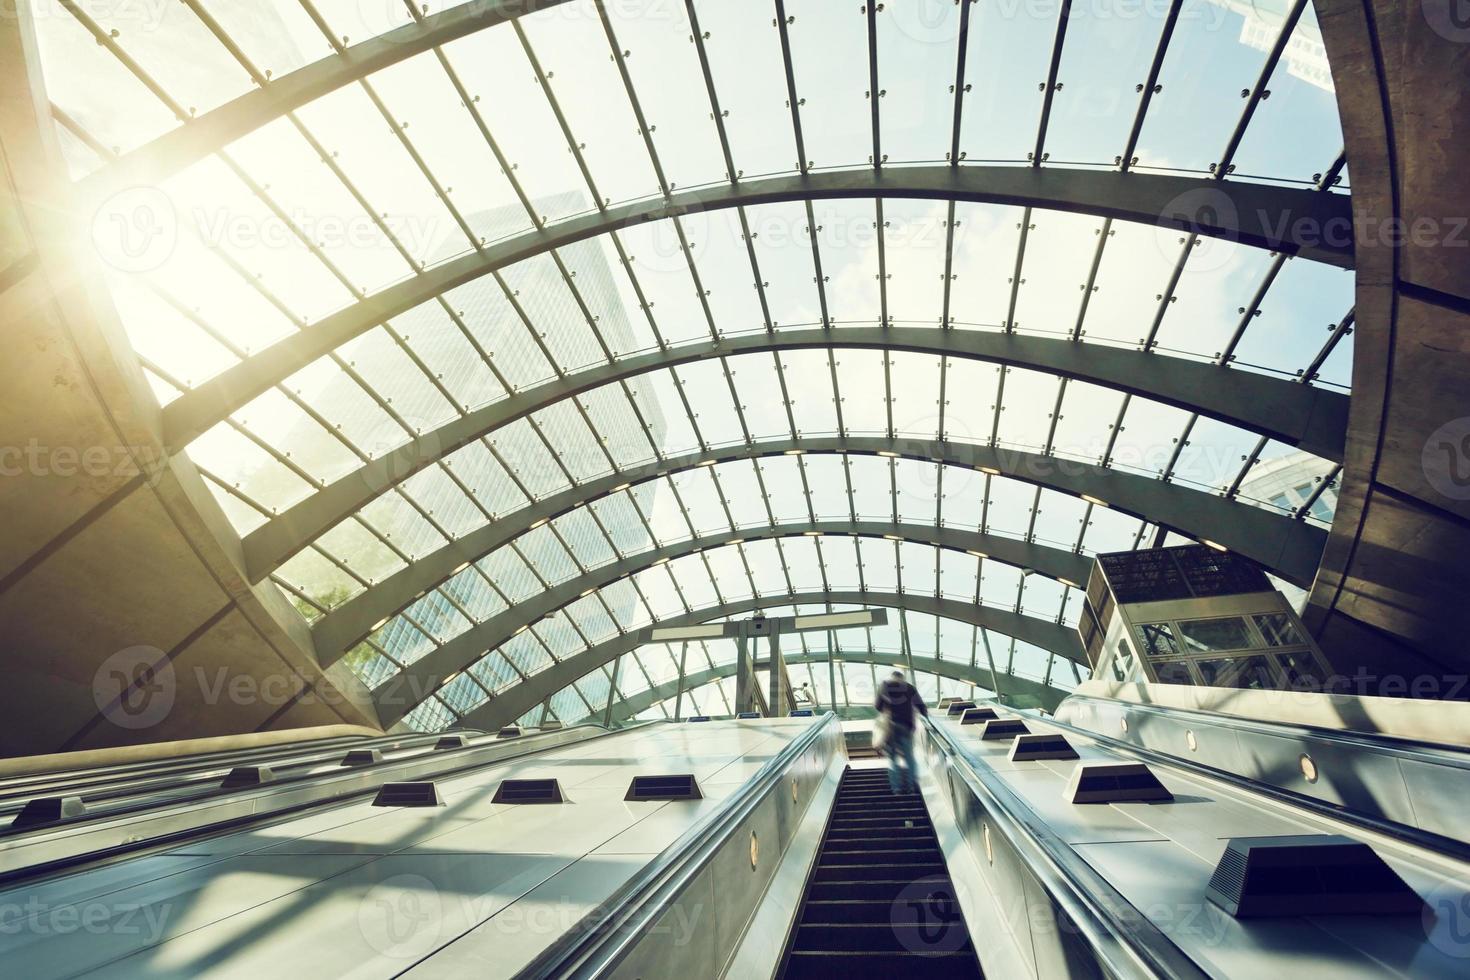 La station de métro Canary Wharf, Londres, Angleterre, Royaume-Uni photo